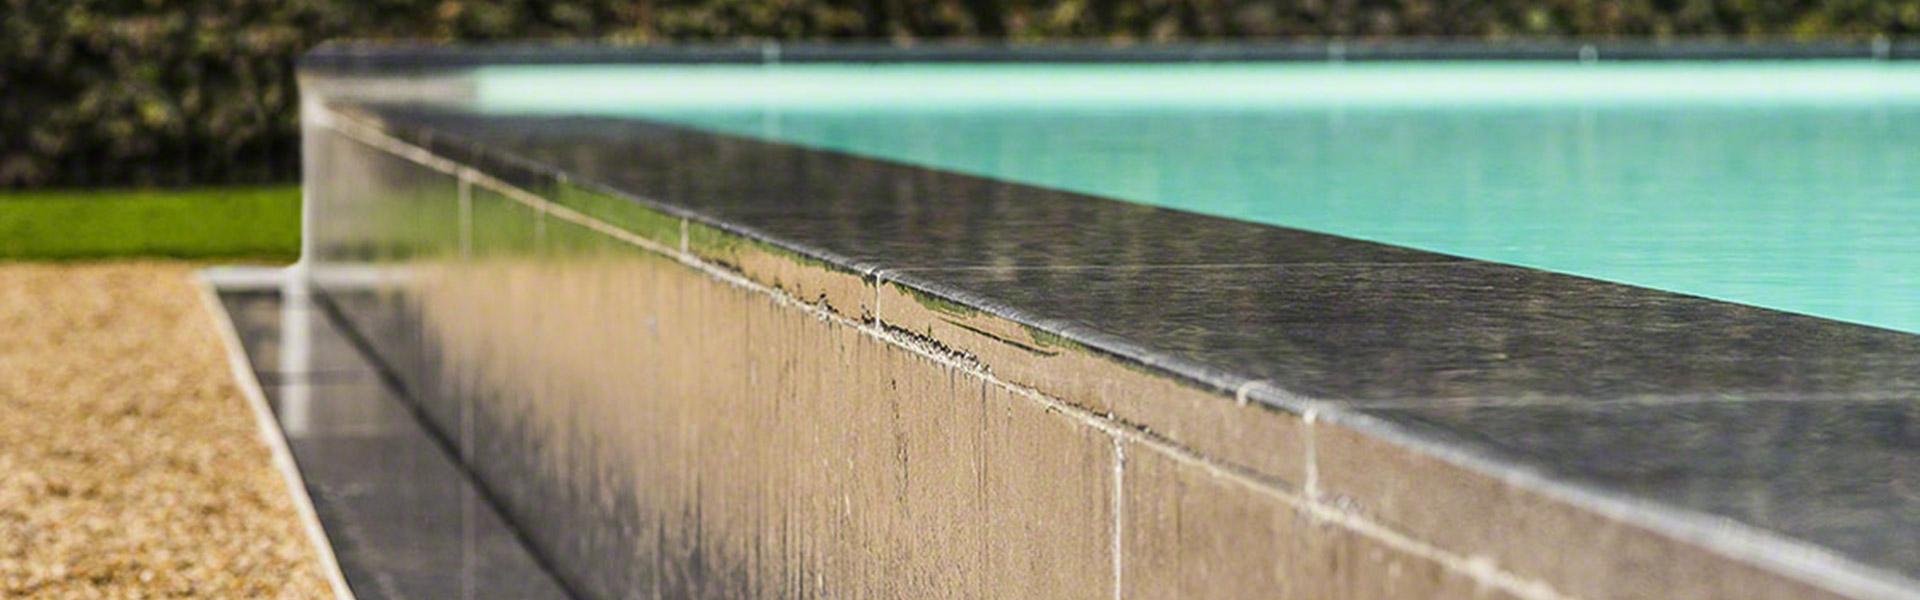 Zwembadzelfbouwen.be Home Slide